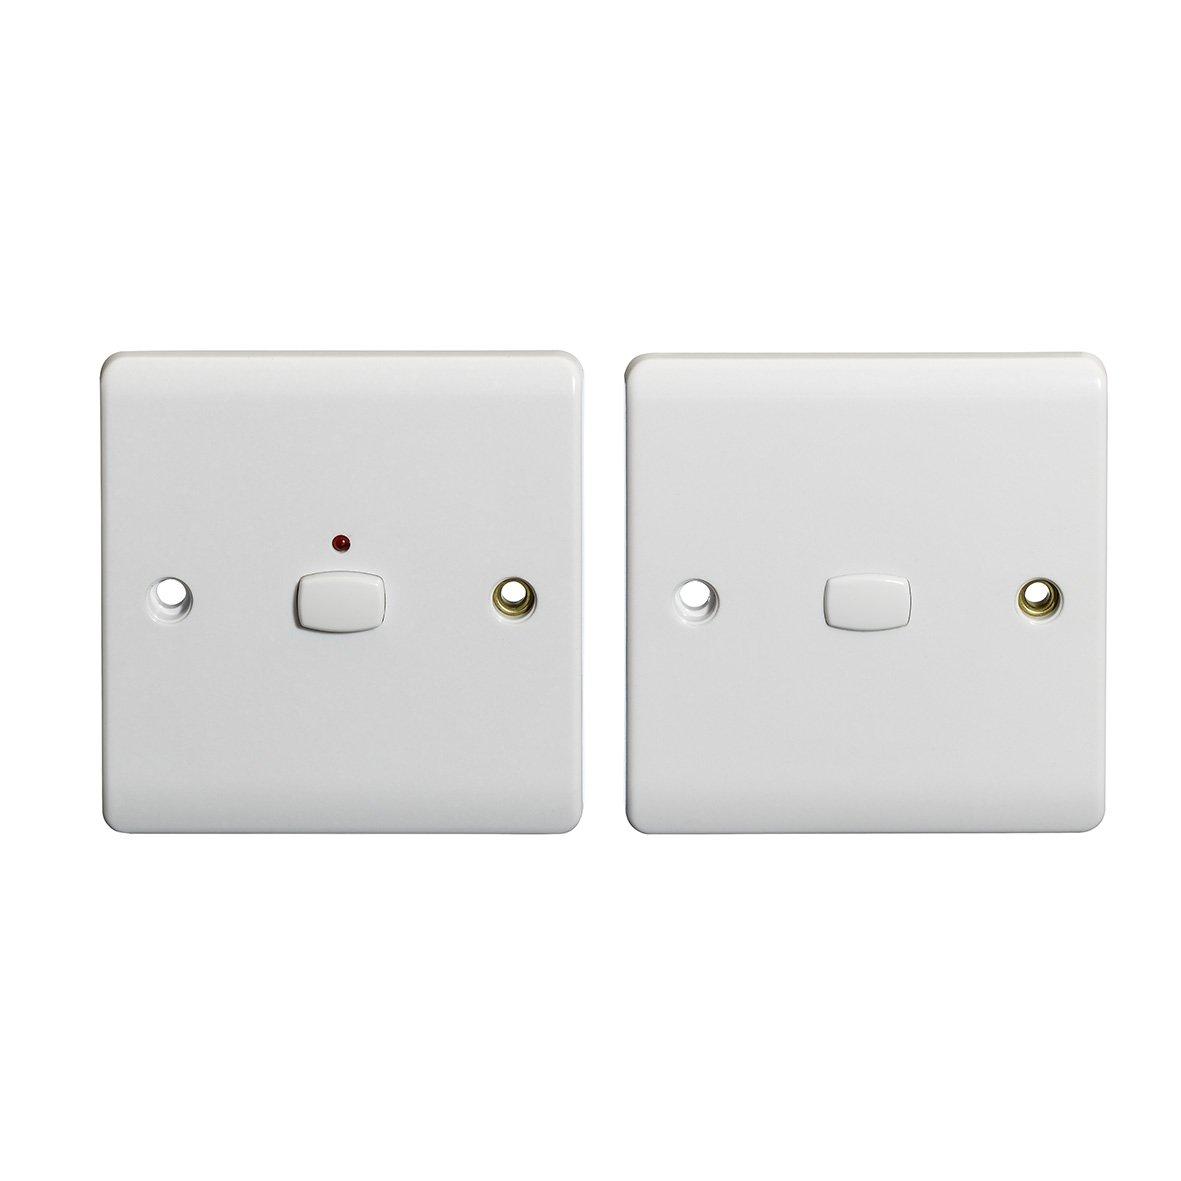 Energenie MIHO043 Alexa Compatible MiHome 2-Way Light Switch, 250 W ...